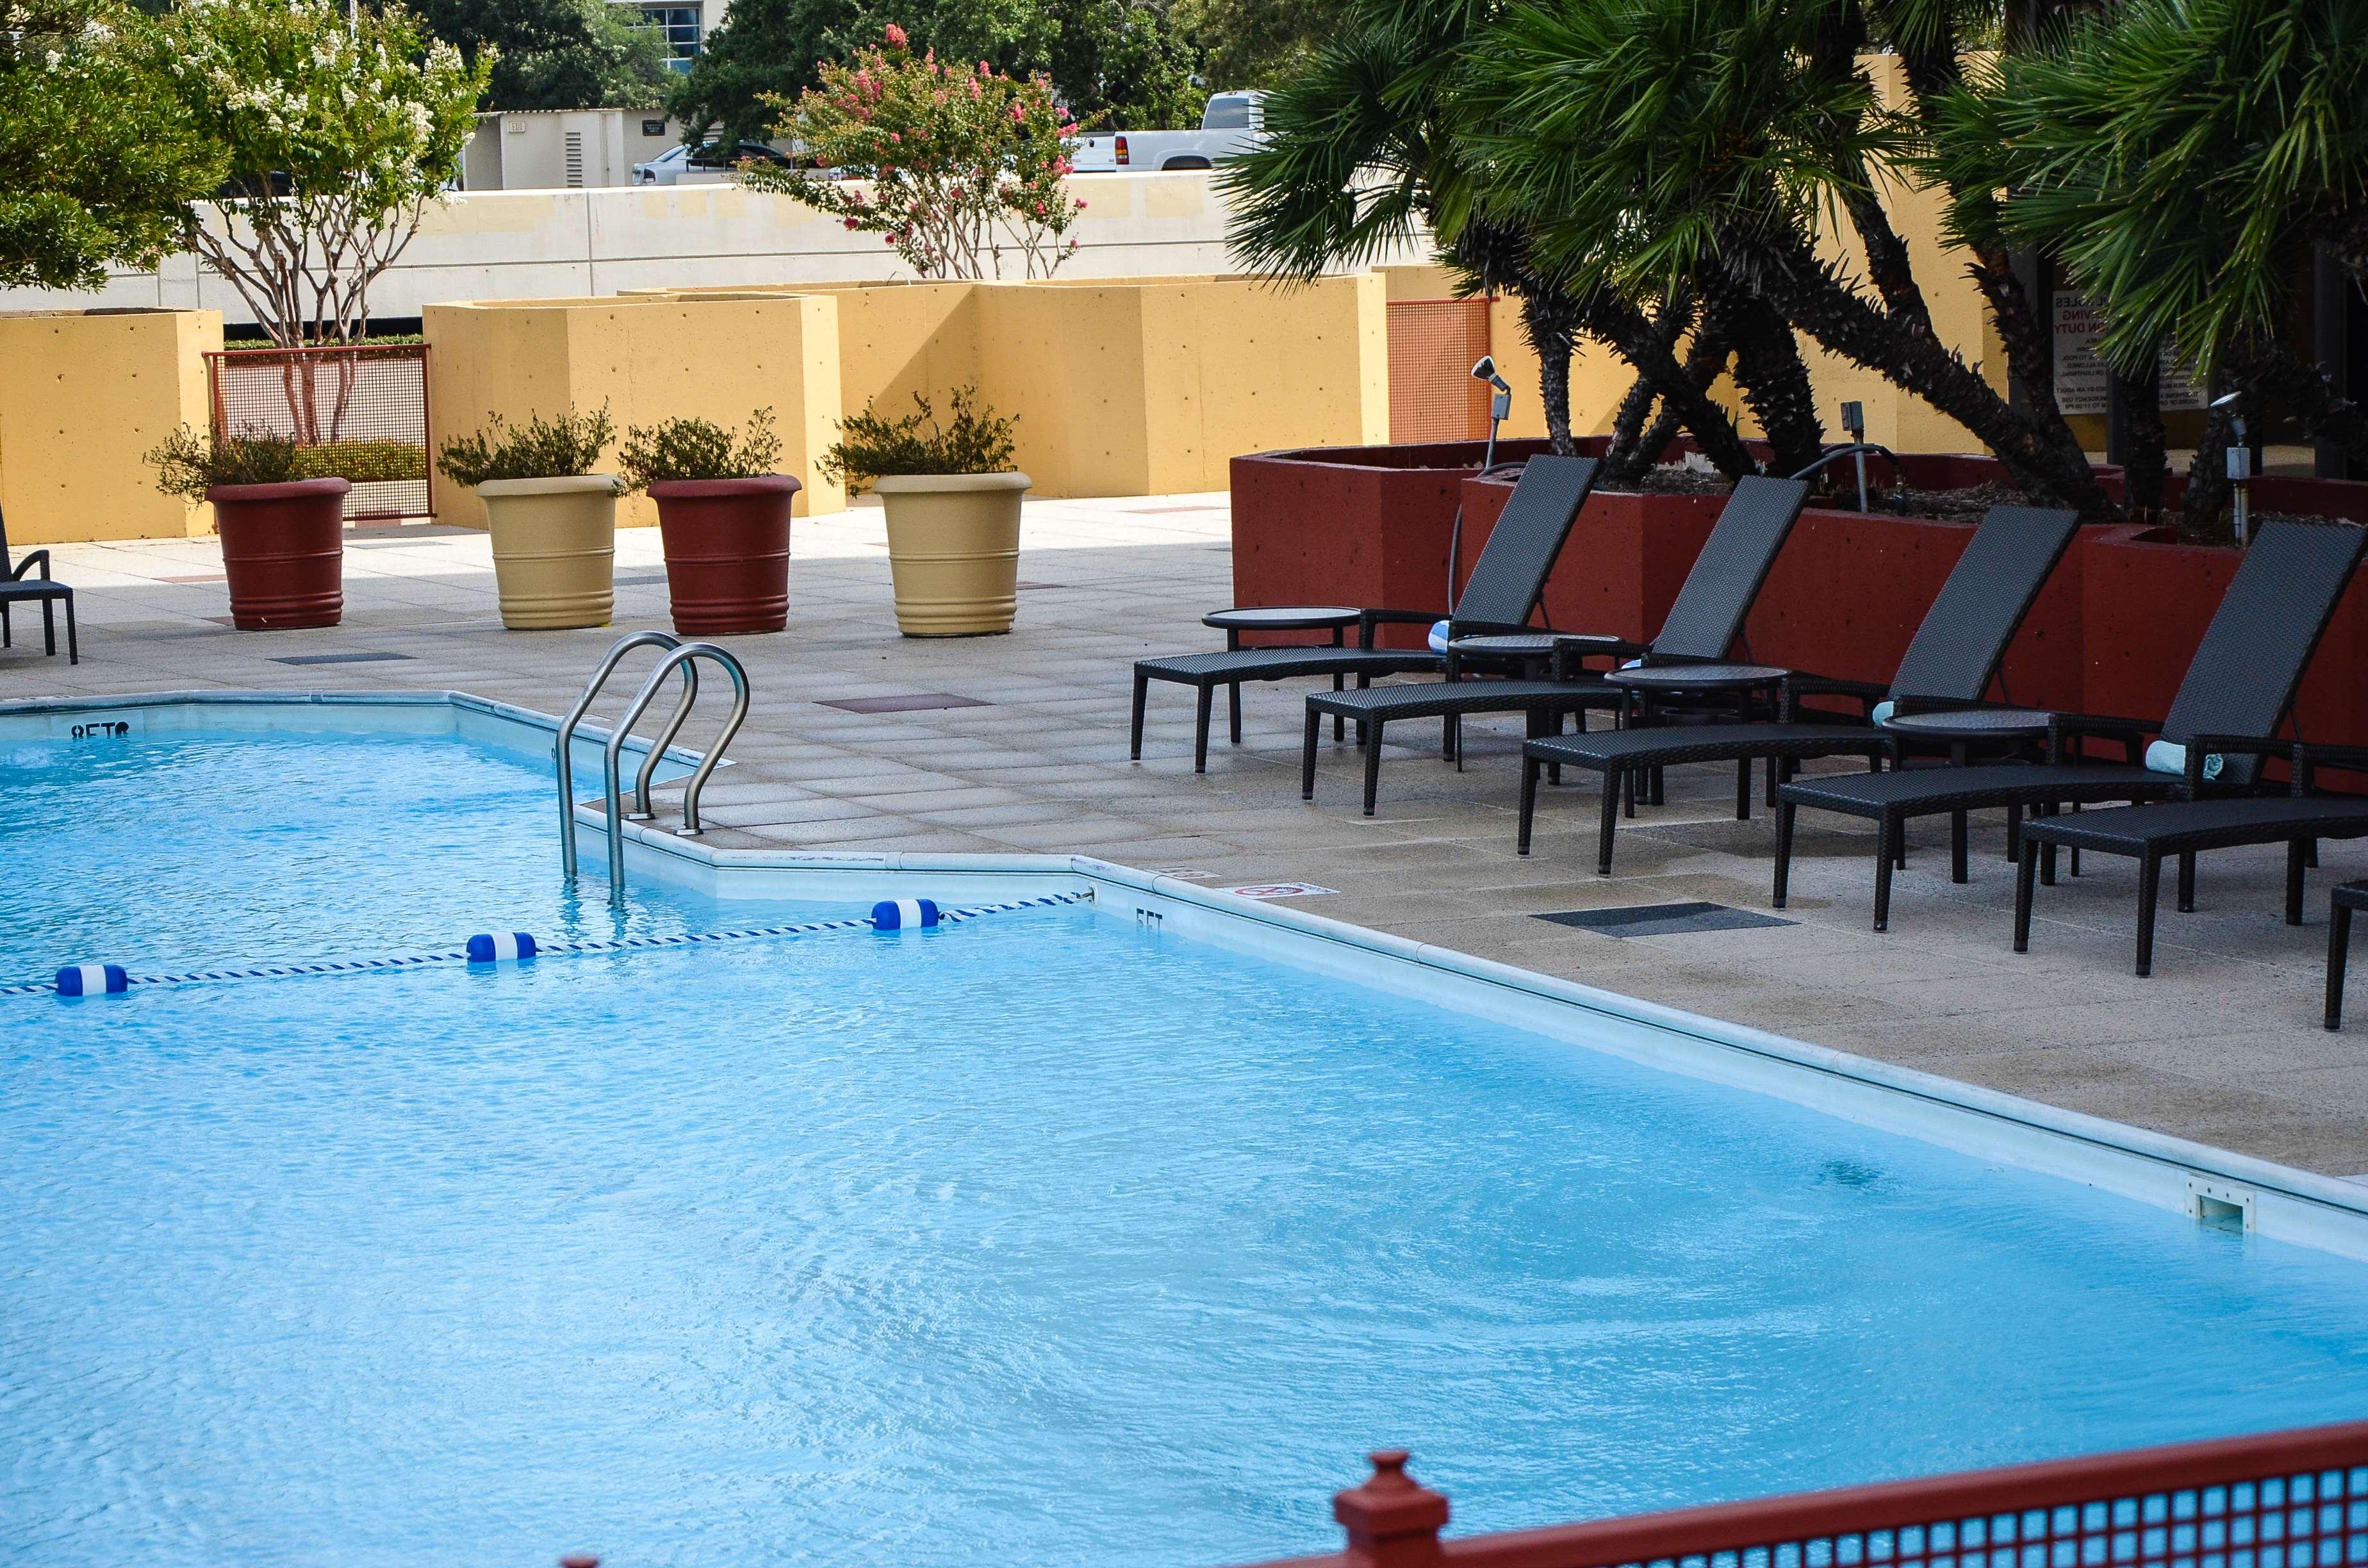 DoubleTree by Hilton Hotel Houston - Greenway Plaza image 6